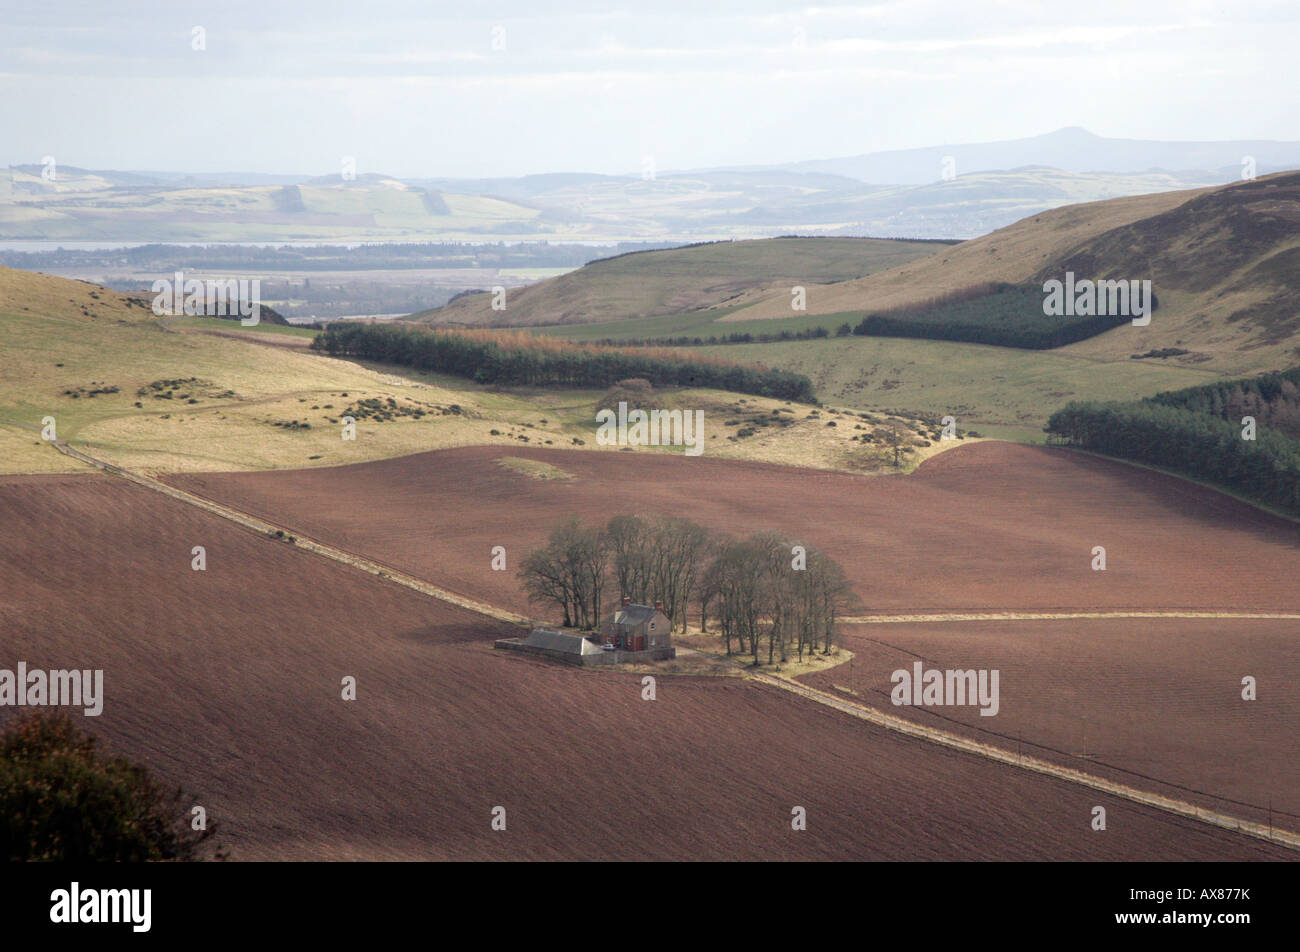 FARM SCENE AT FOOT OF DUNSINANE HILL OF MACBETH FAME,PERTHSHIRE, SCOTLAND,UK - Stock Image